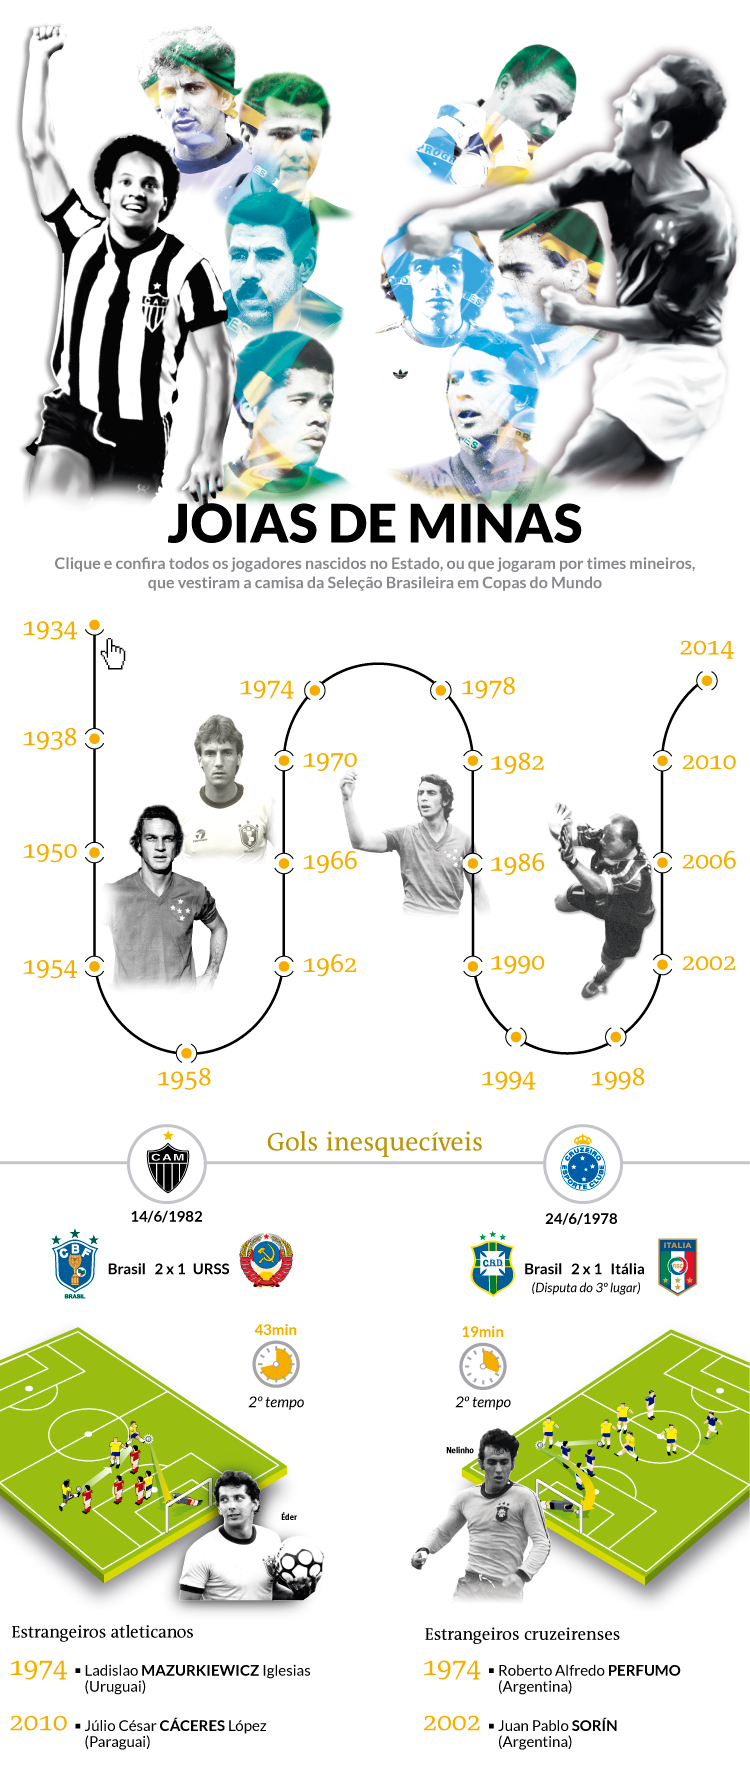 Joias de Minas